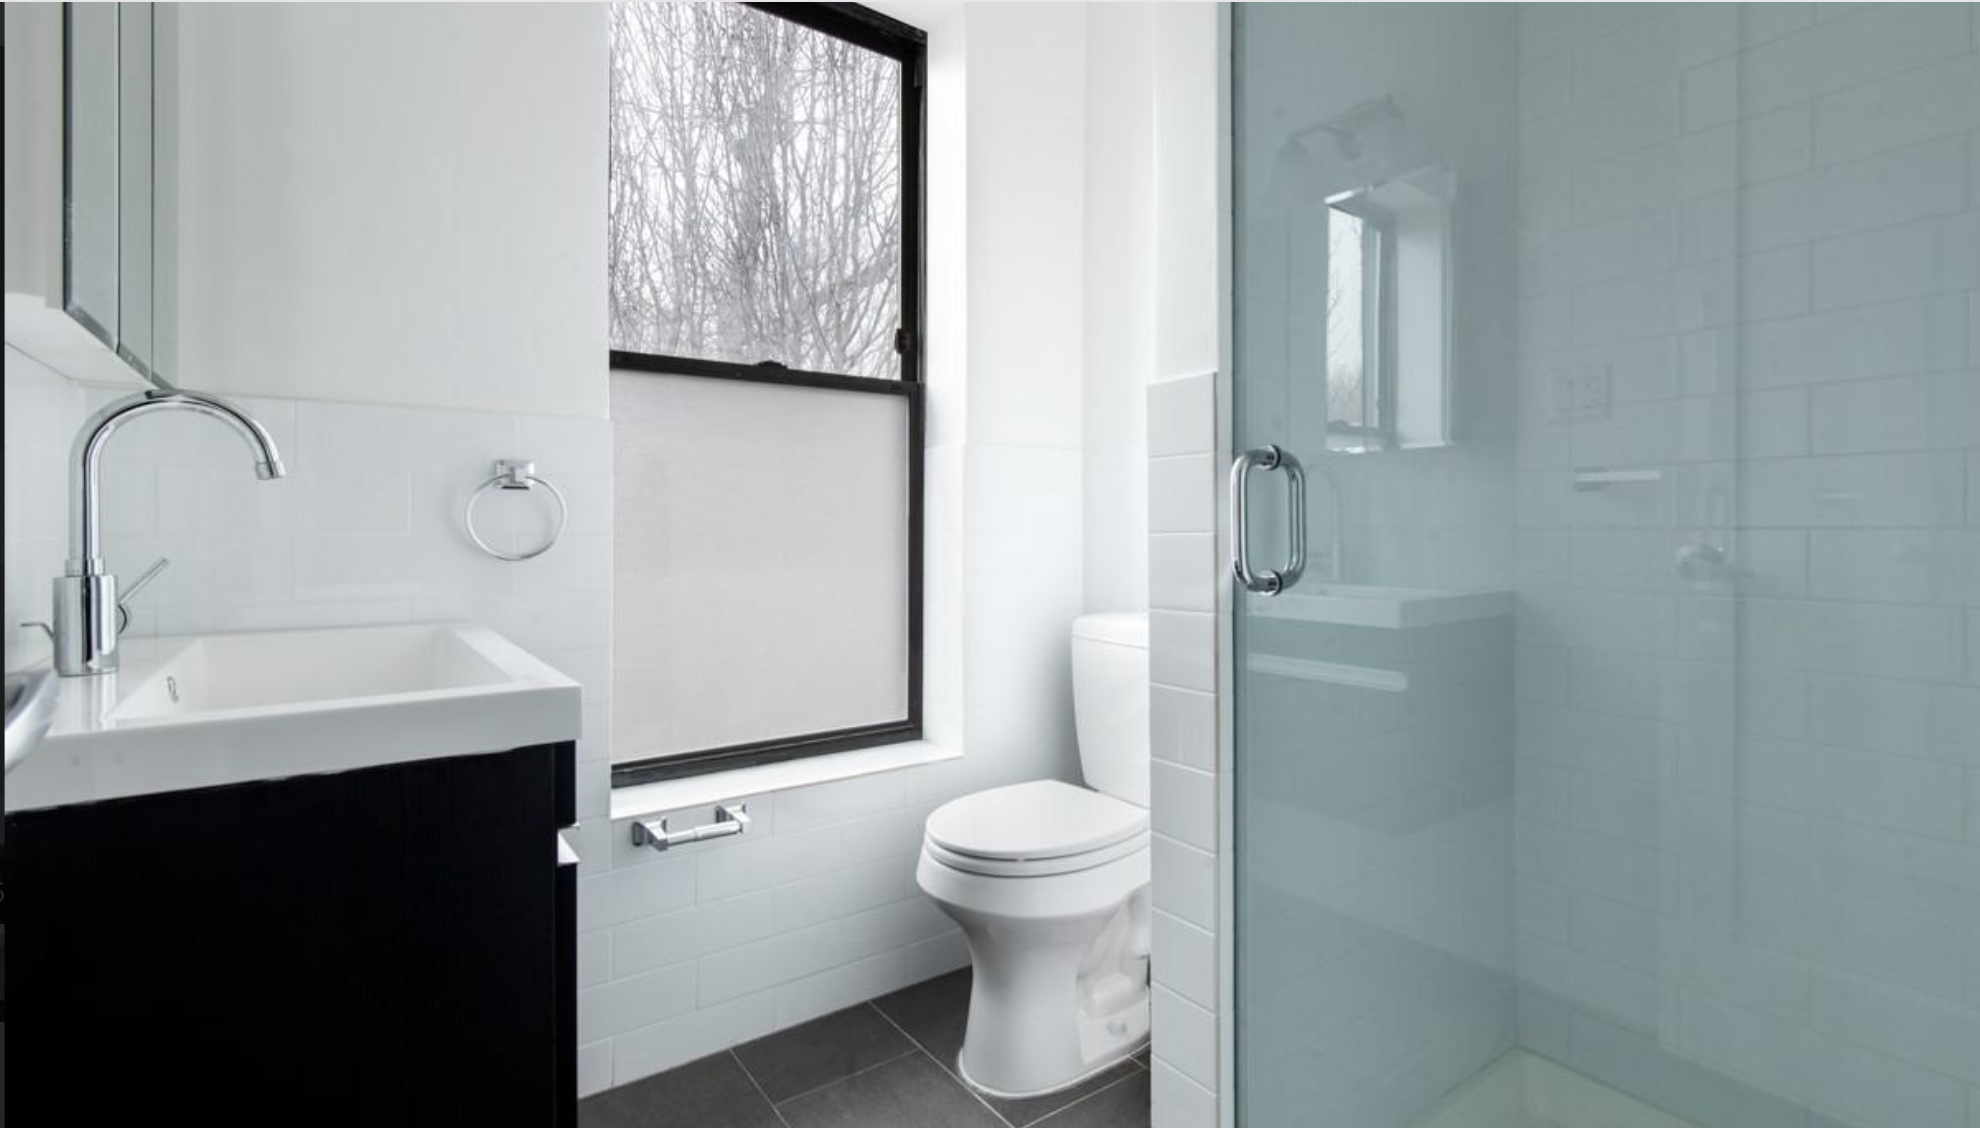 216 Malcolm X Blvd Bathroom Apt 3R.png